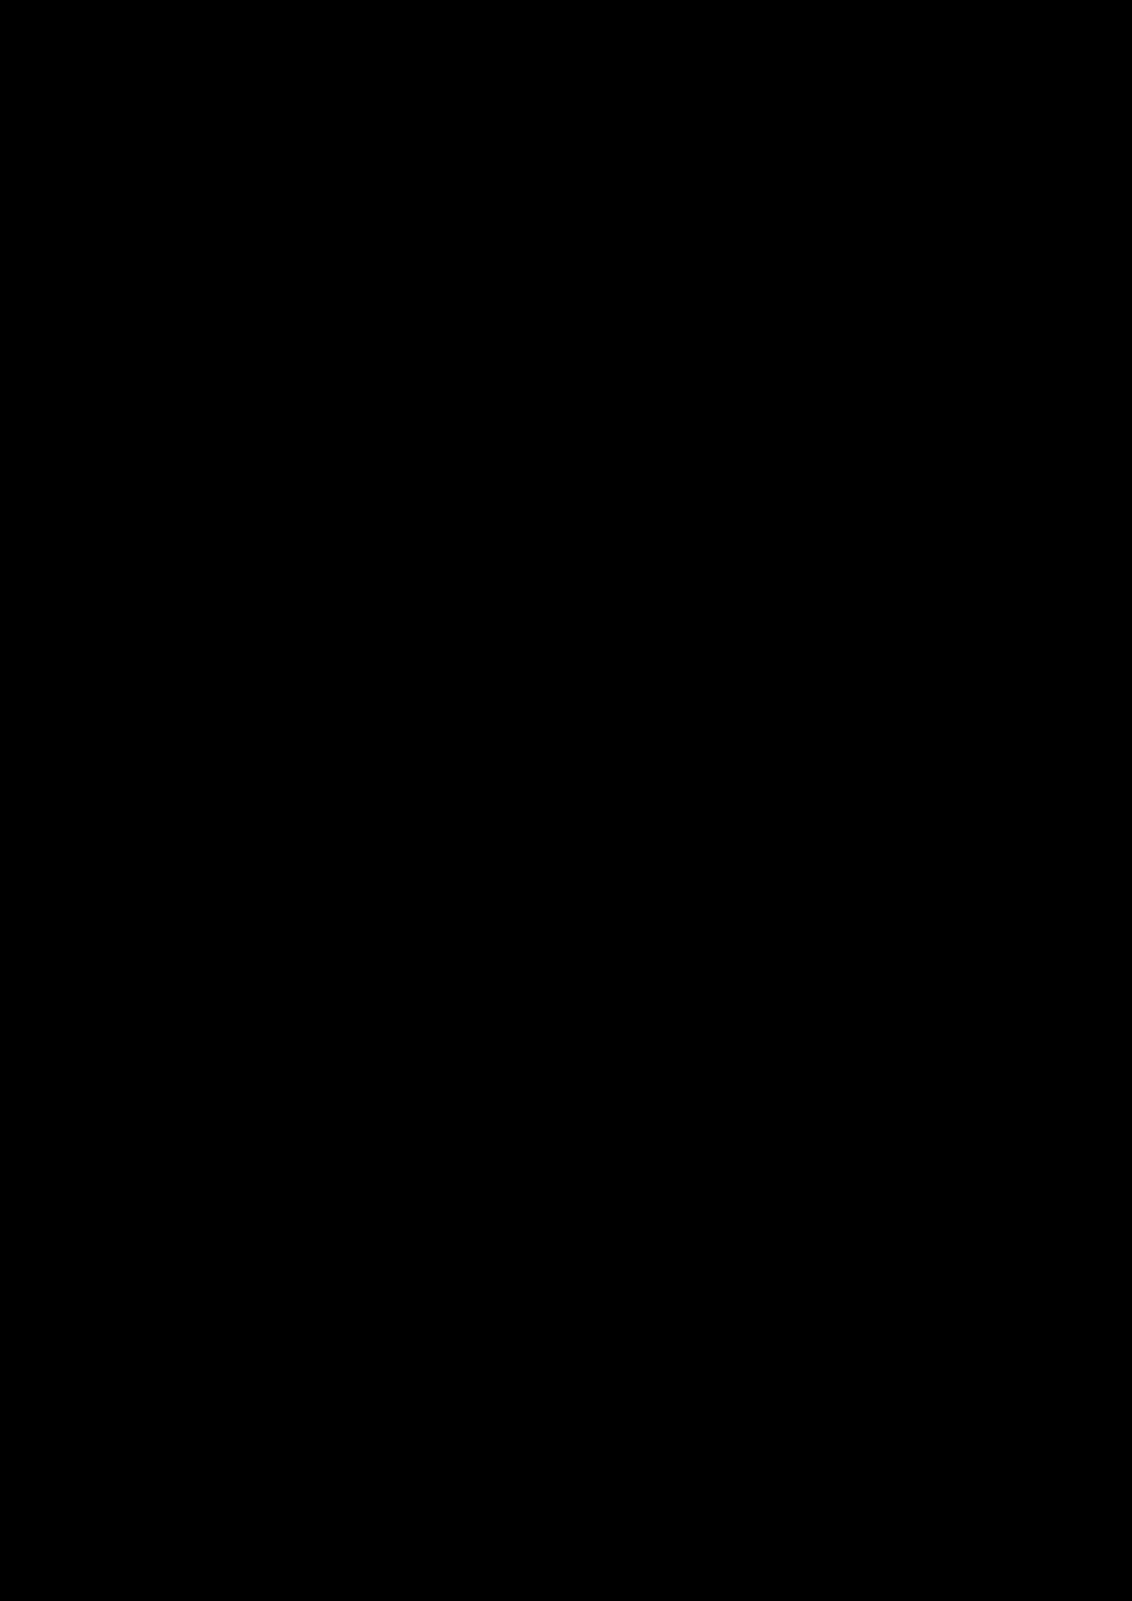 18 berez slide, Image 4